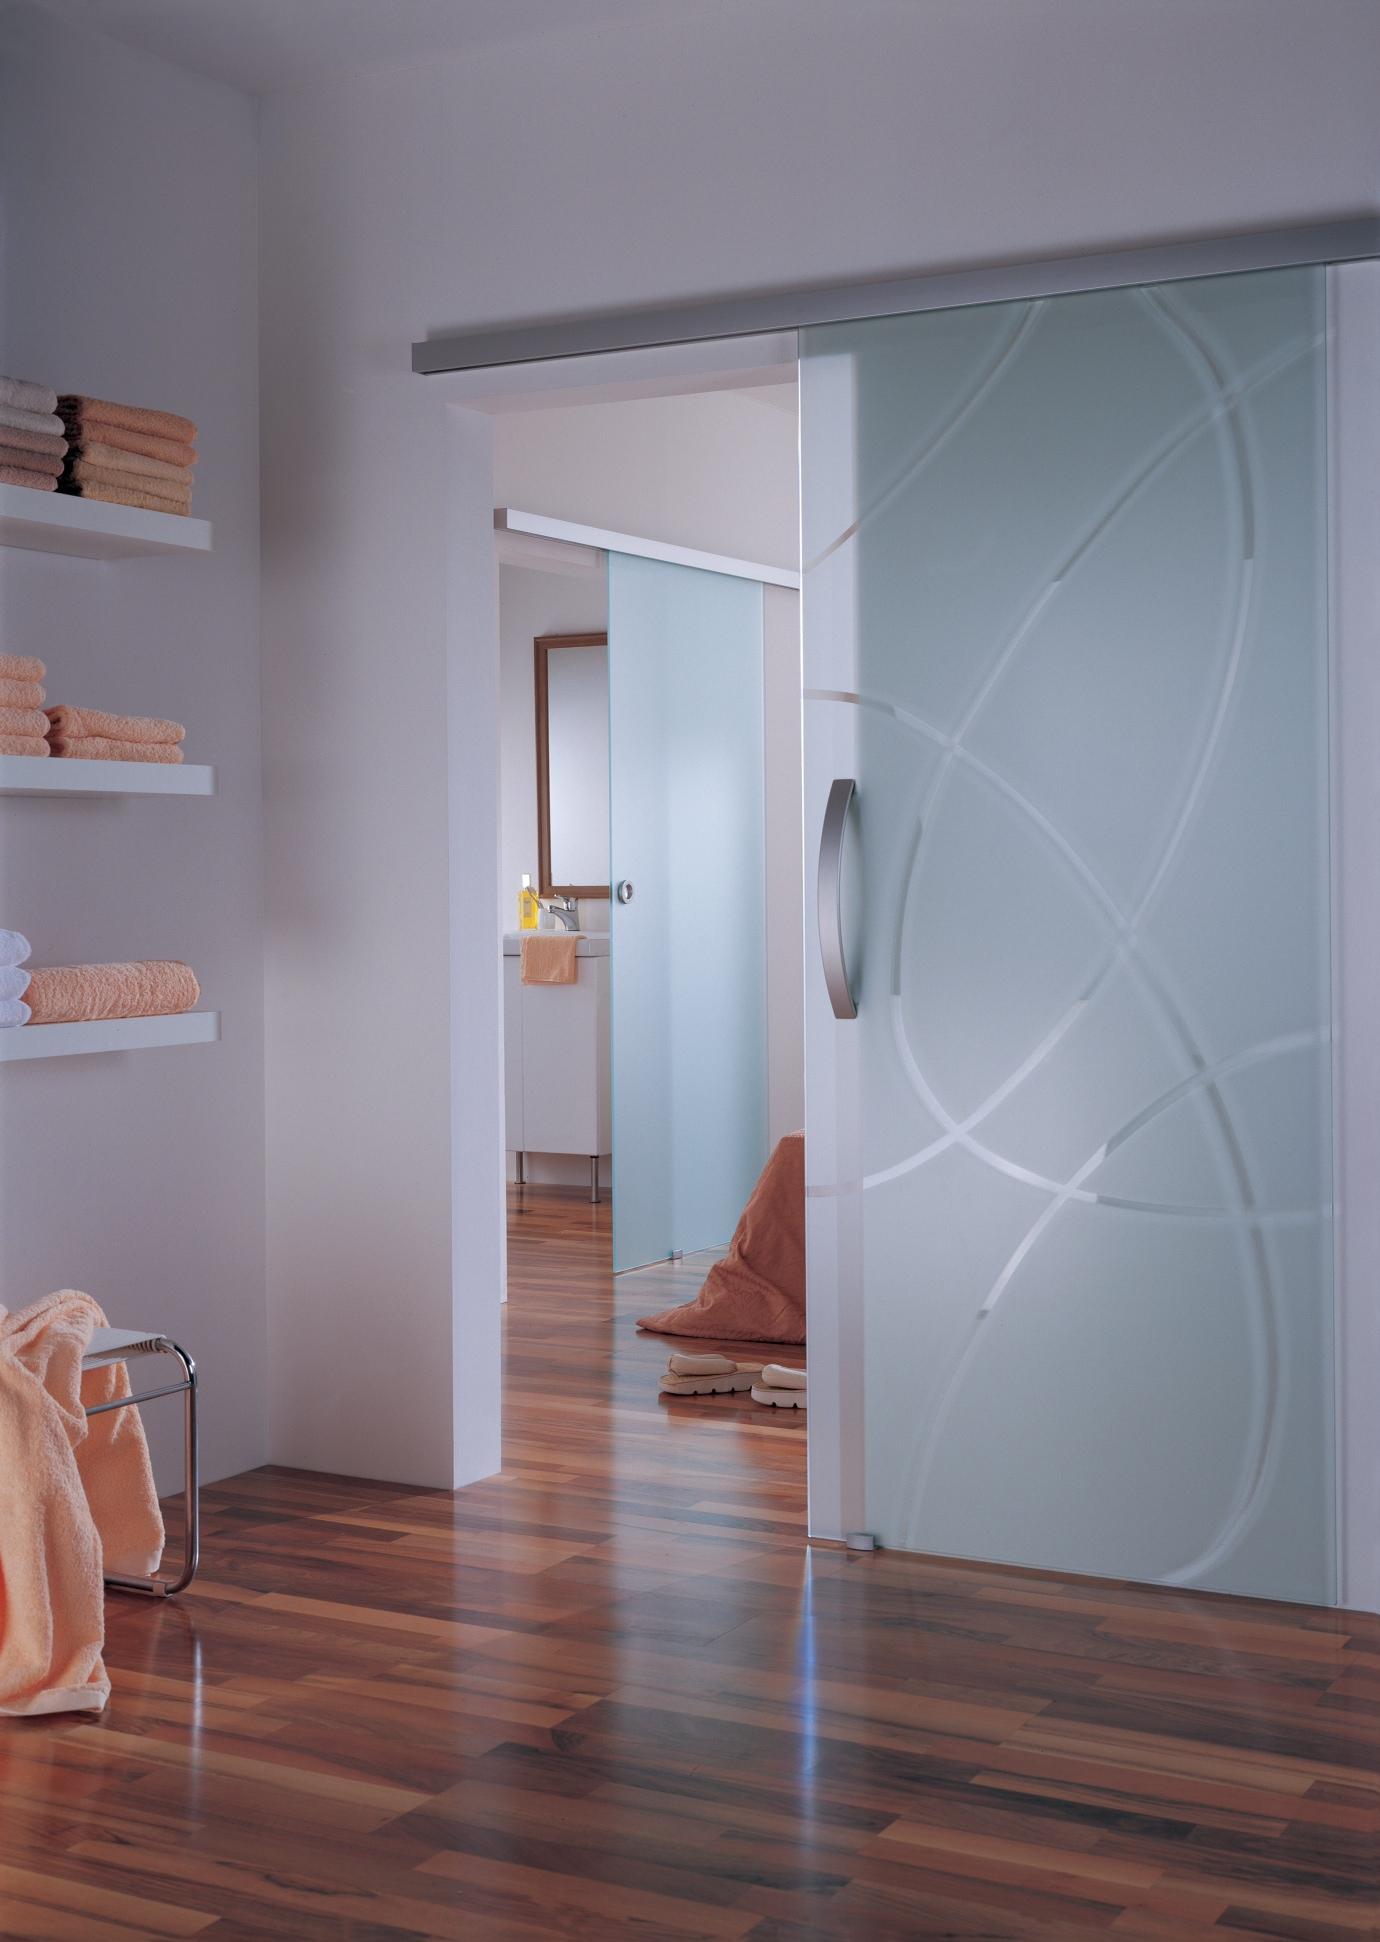 dorma automatic sliding door installation manual